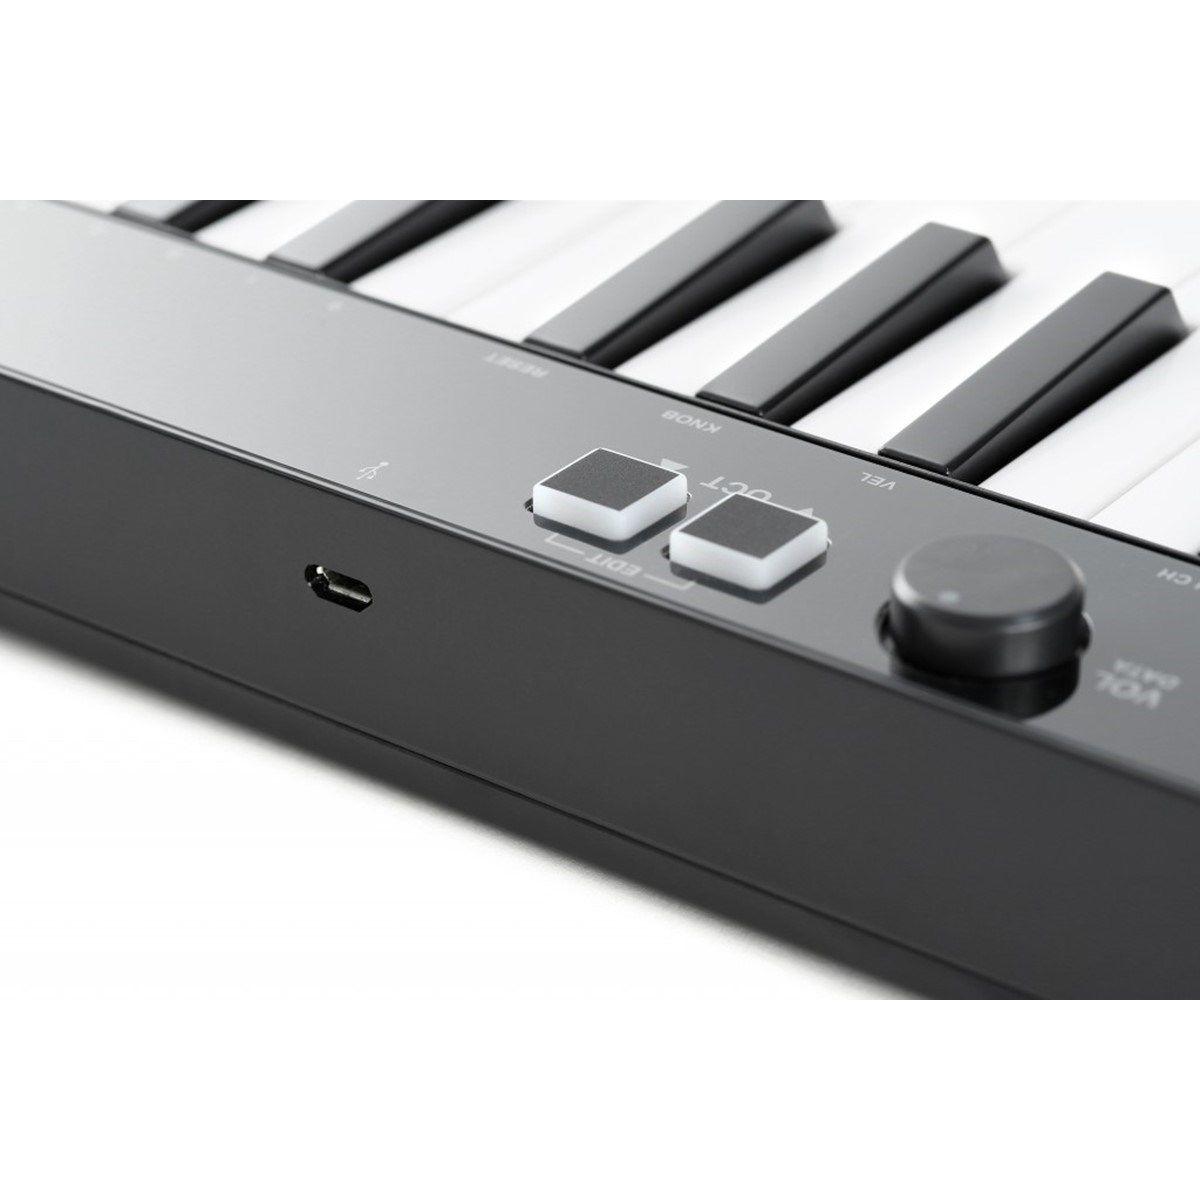 Teclado IK Multimedia MIDI USB iRig Keys 25